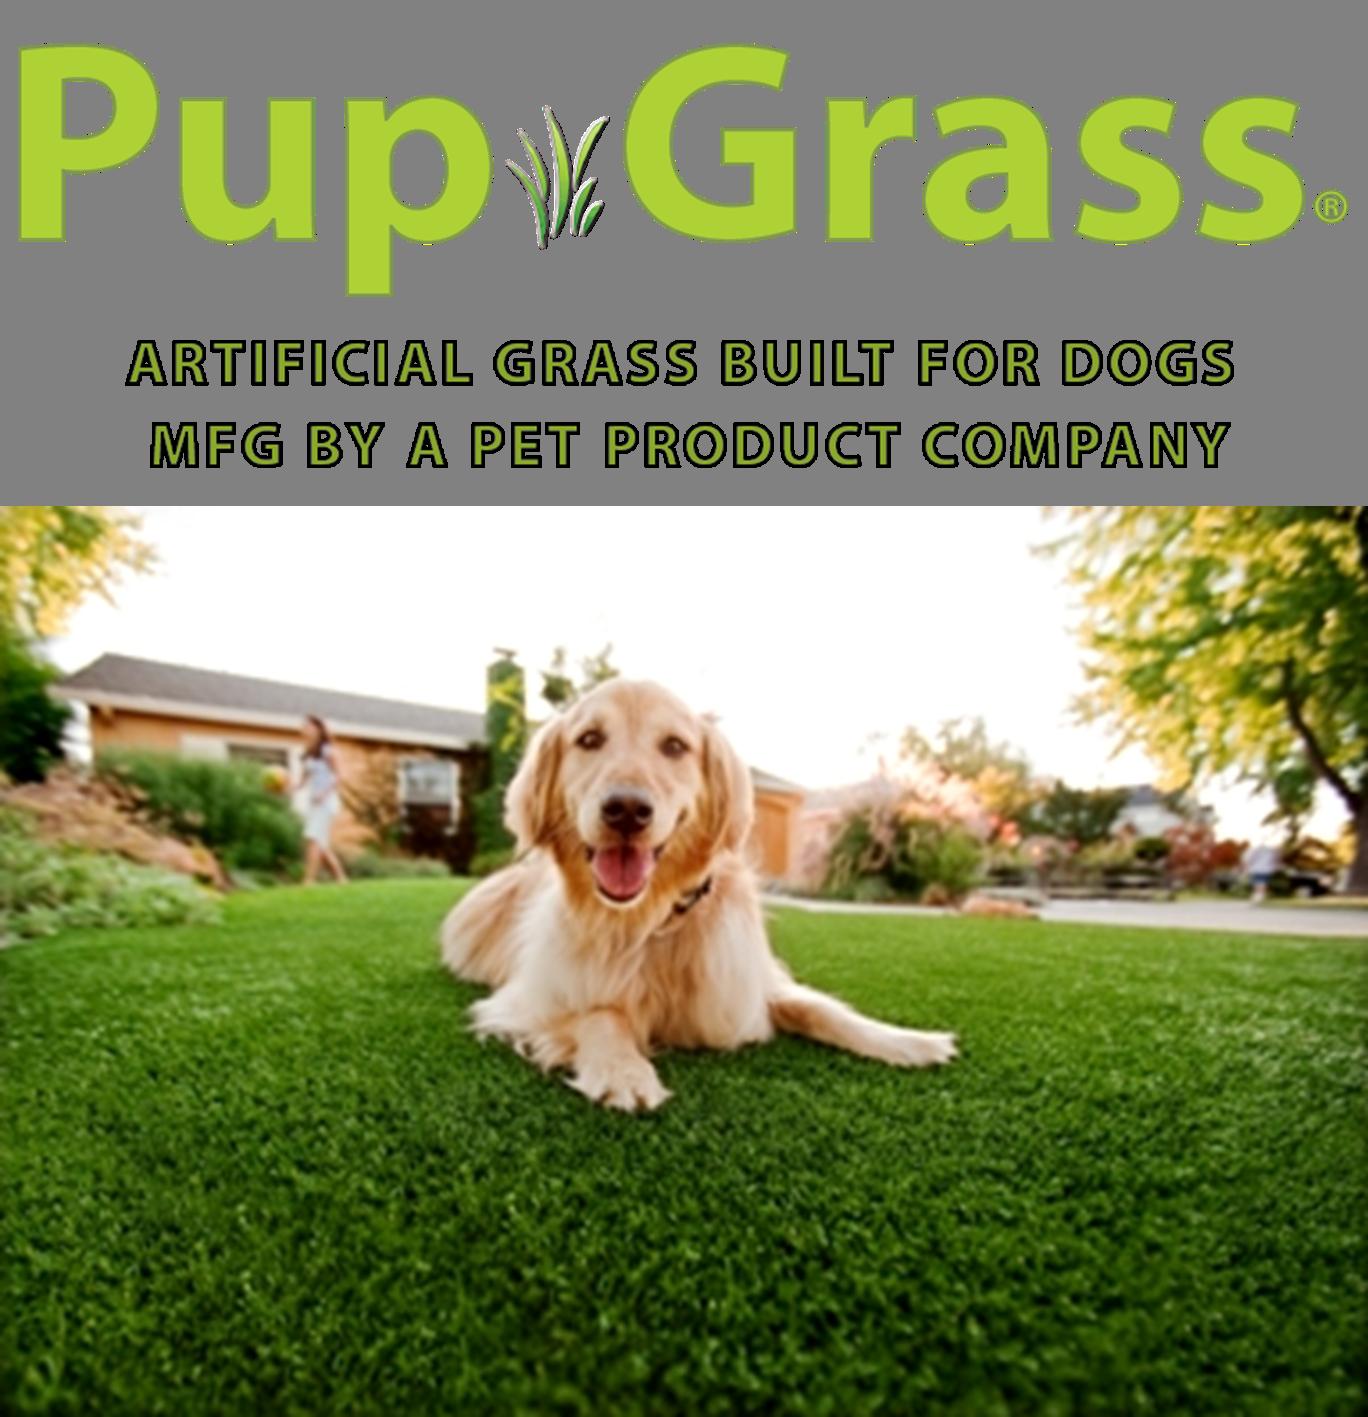 PupGrass® Artificial Grass Built for Dogs Artificial